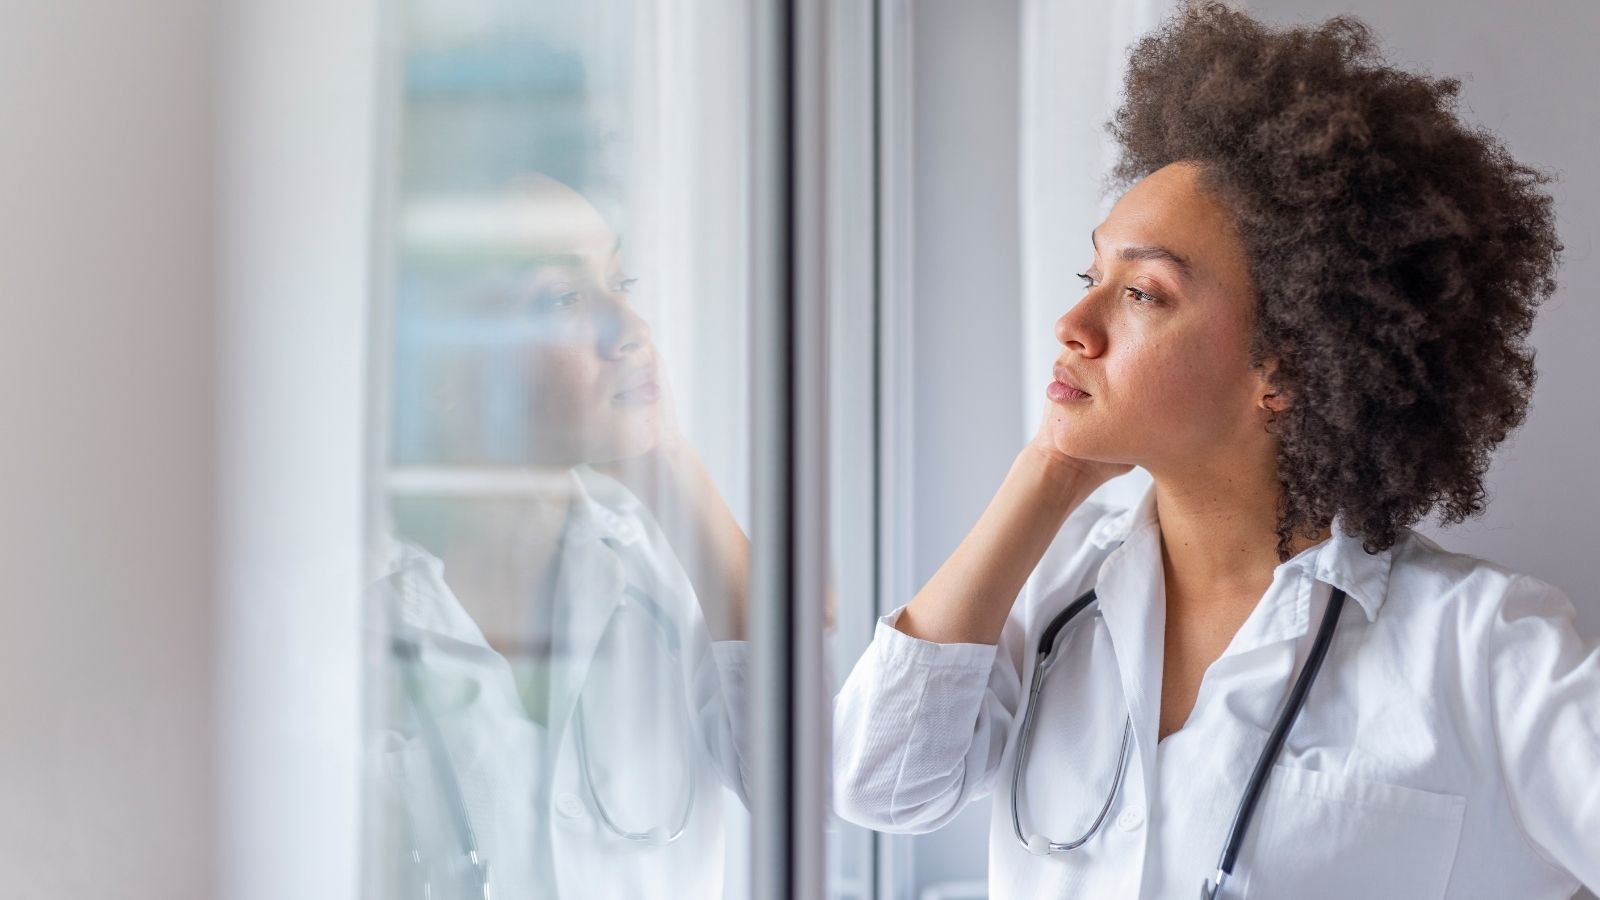 Sad female nurse in uniform staring out the window thinking.